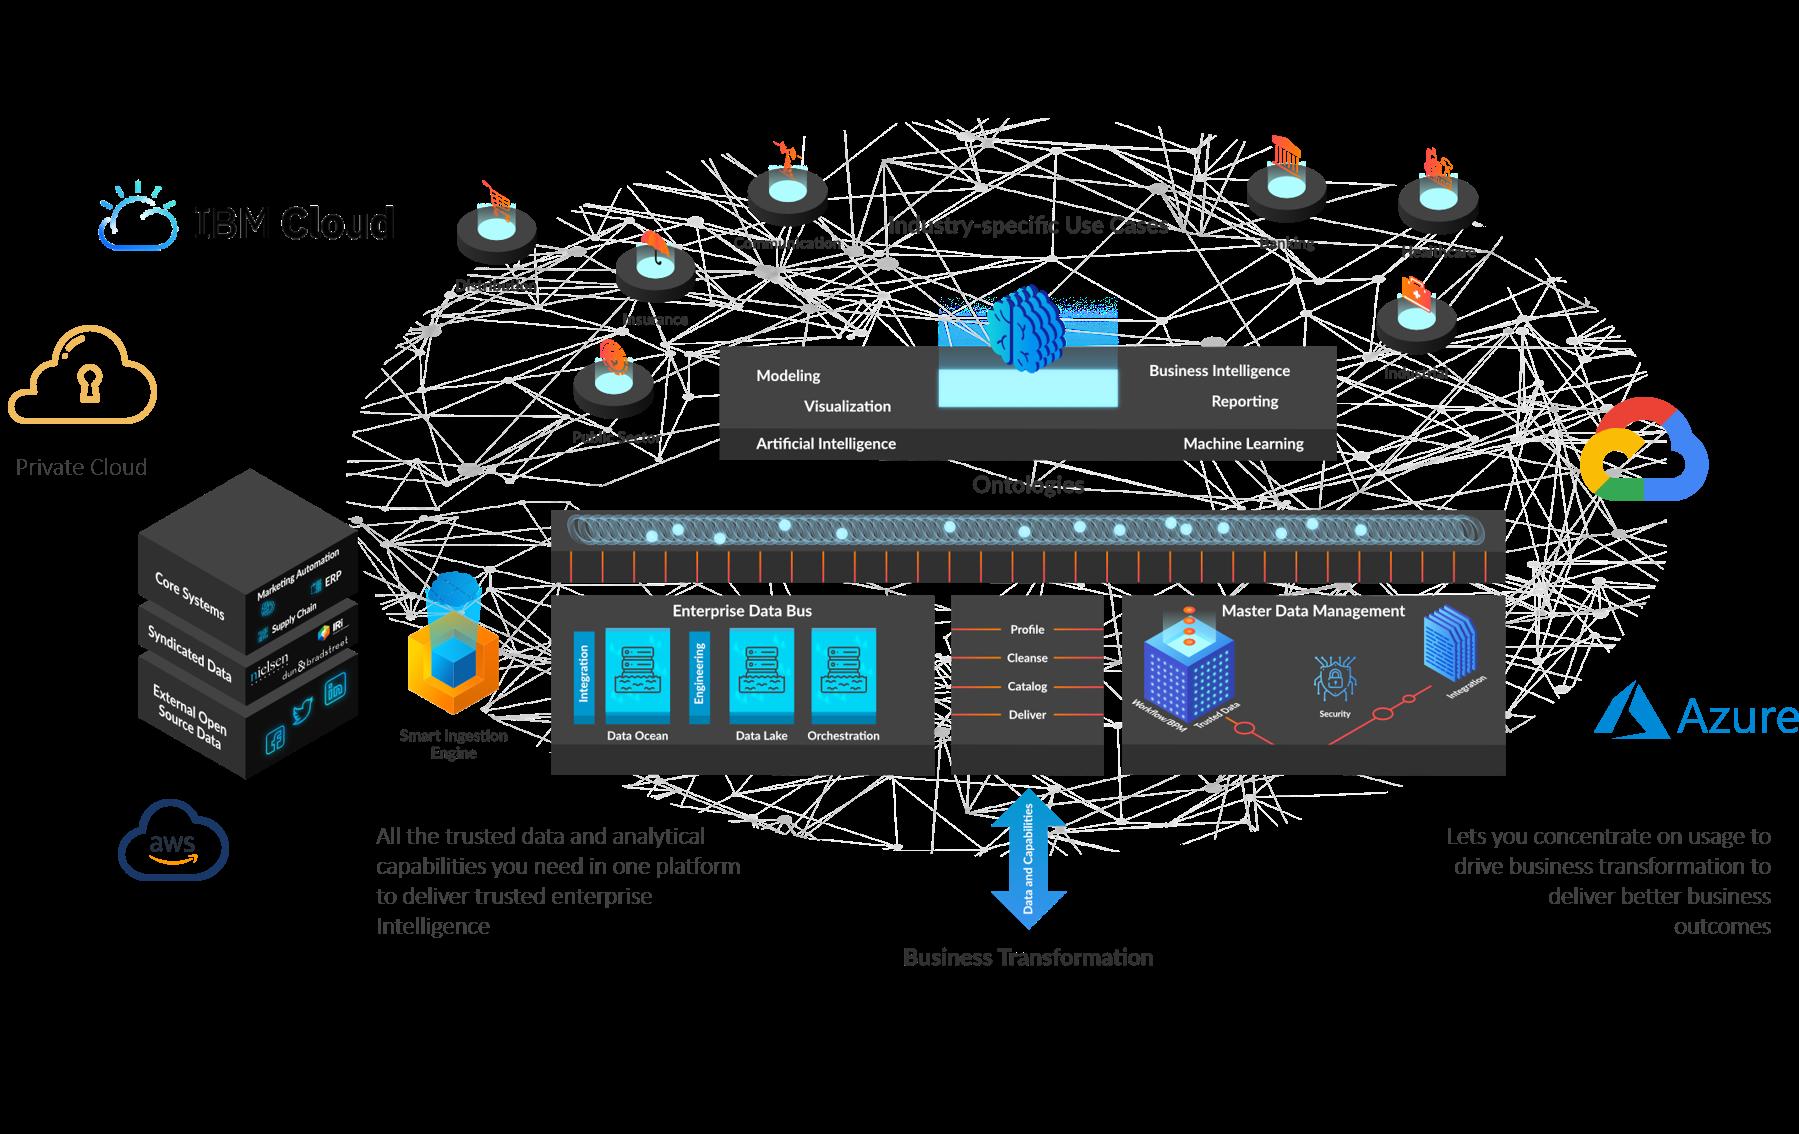 Enterprise Intelligence Hub by Mastech InfoTrellis